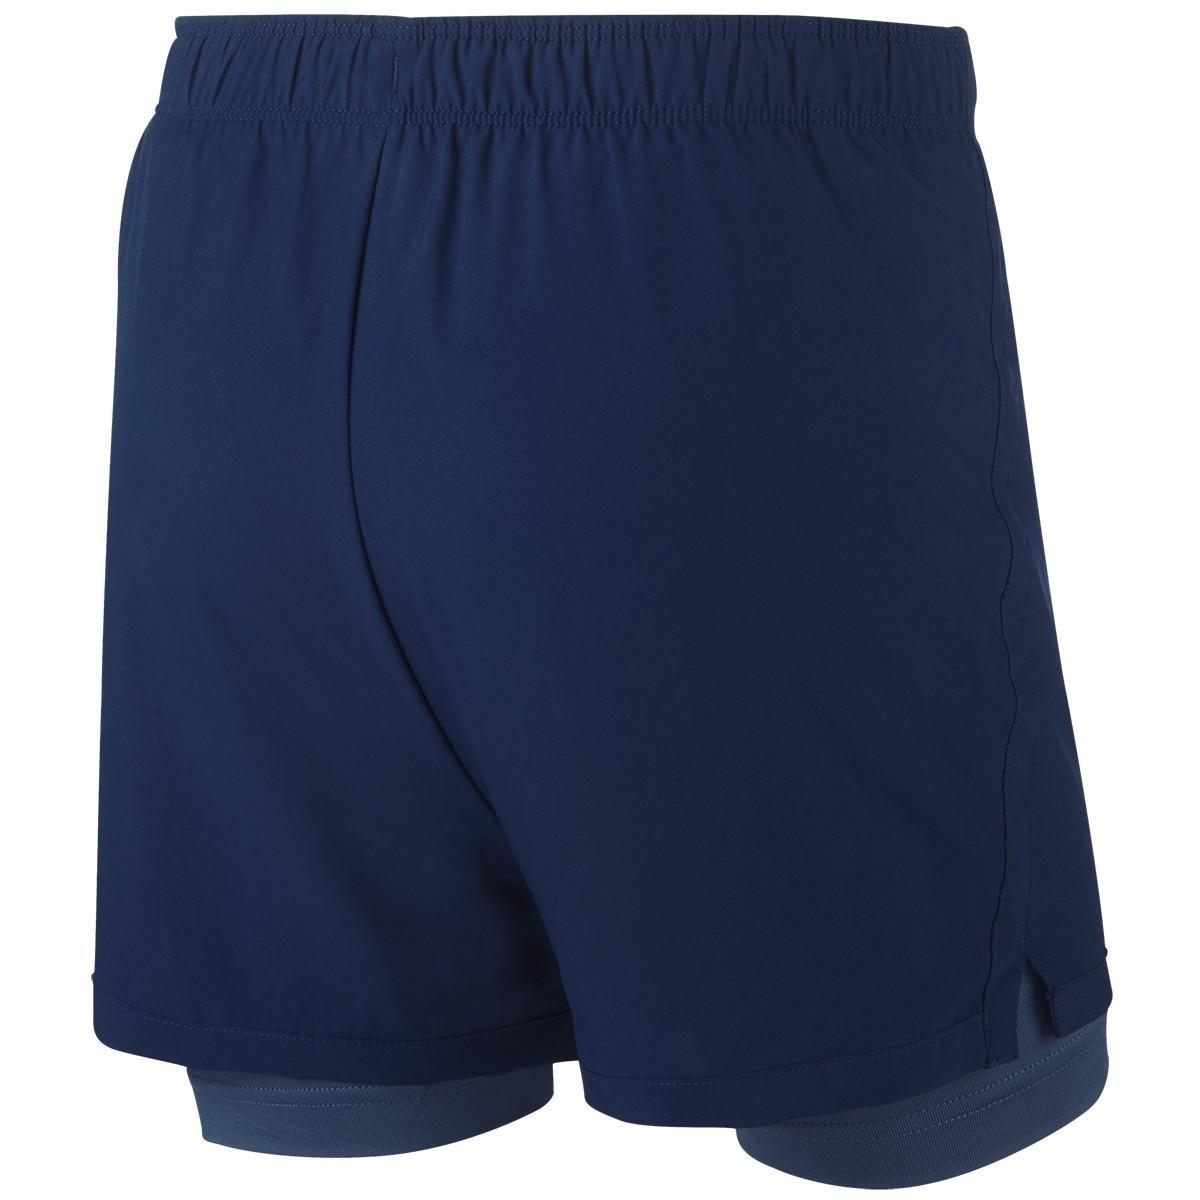 Теннисные шорты детские Nike Dry 2in1 Short Girls blue void/mystic navy